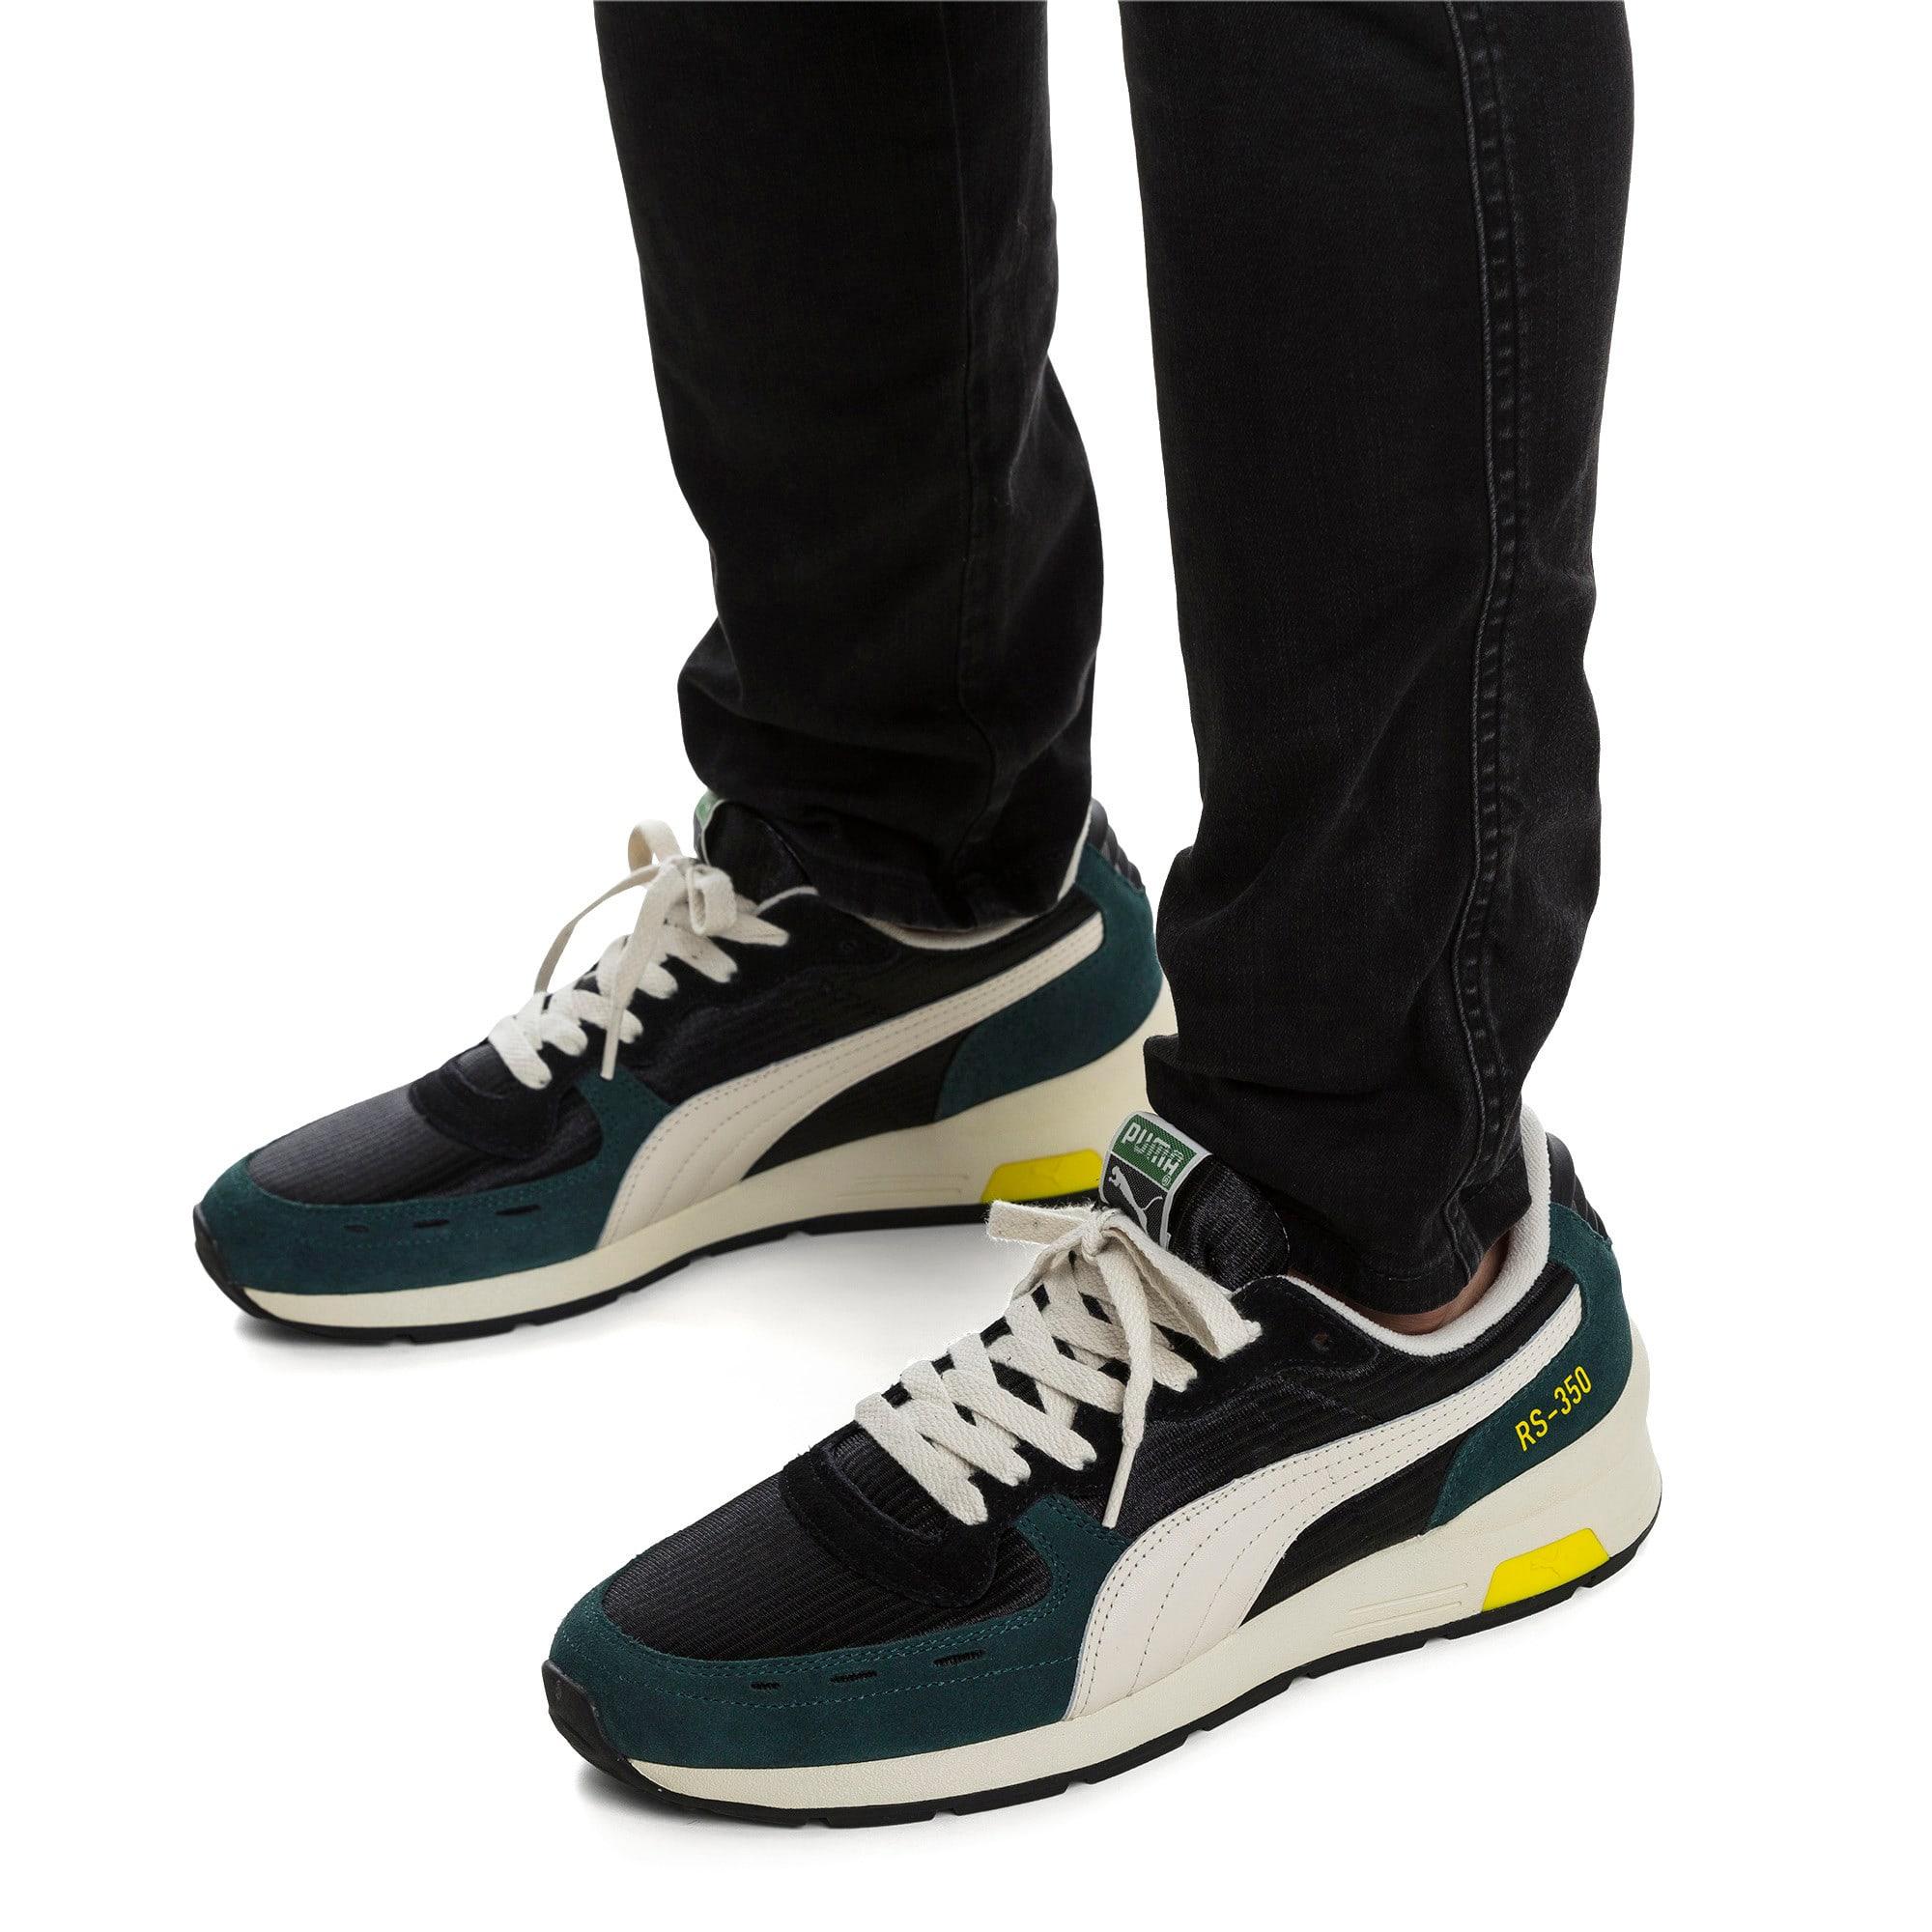 Thumbnail 2 of RS-350 OG Men's Sneakers, Puma Black-Ponderosa Pine, medium